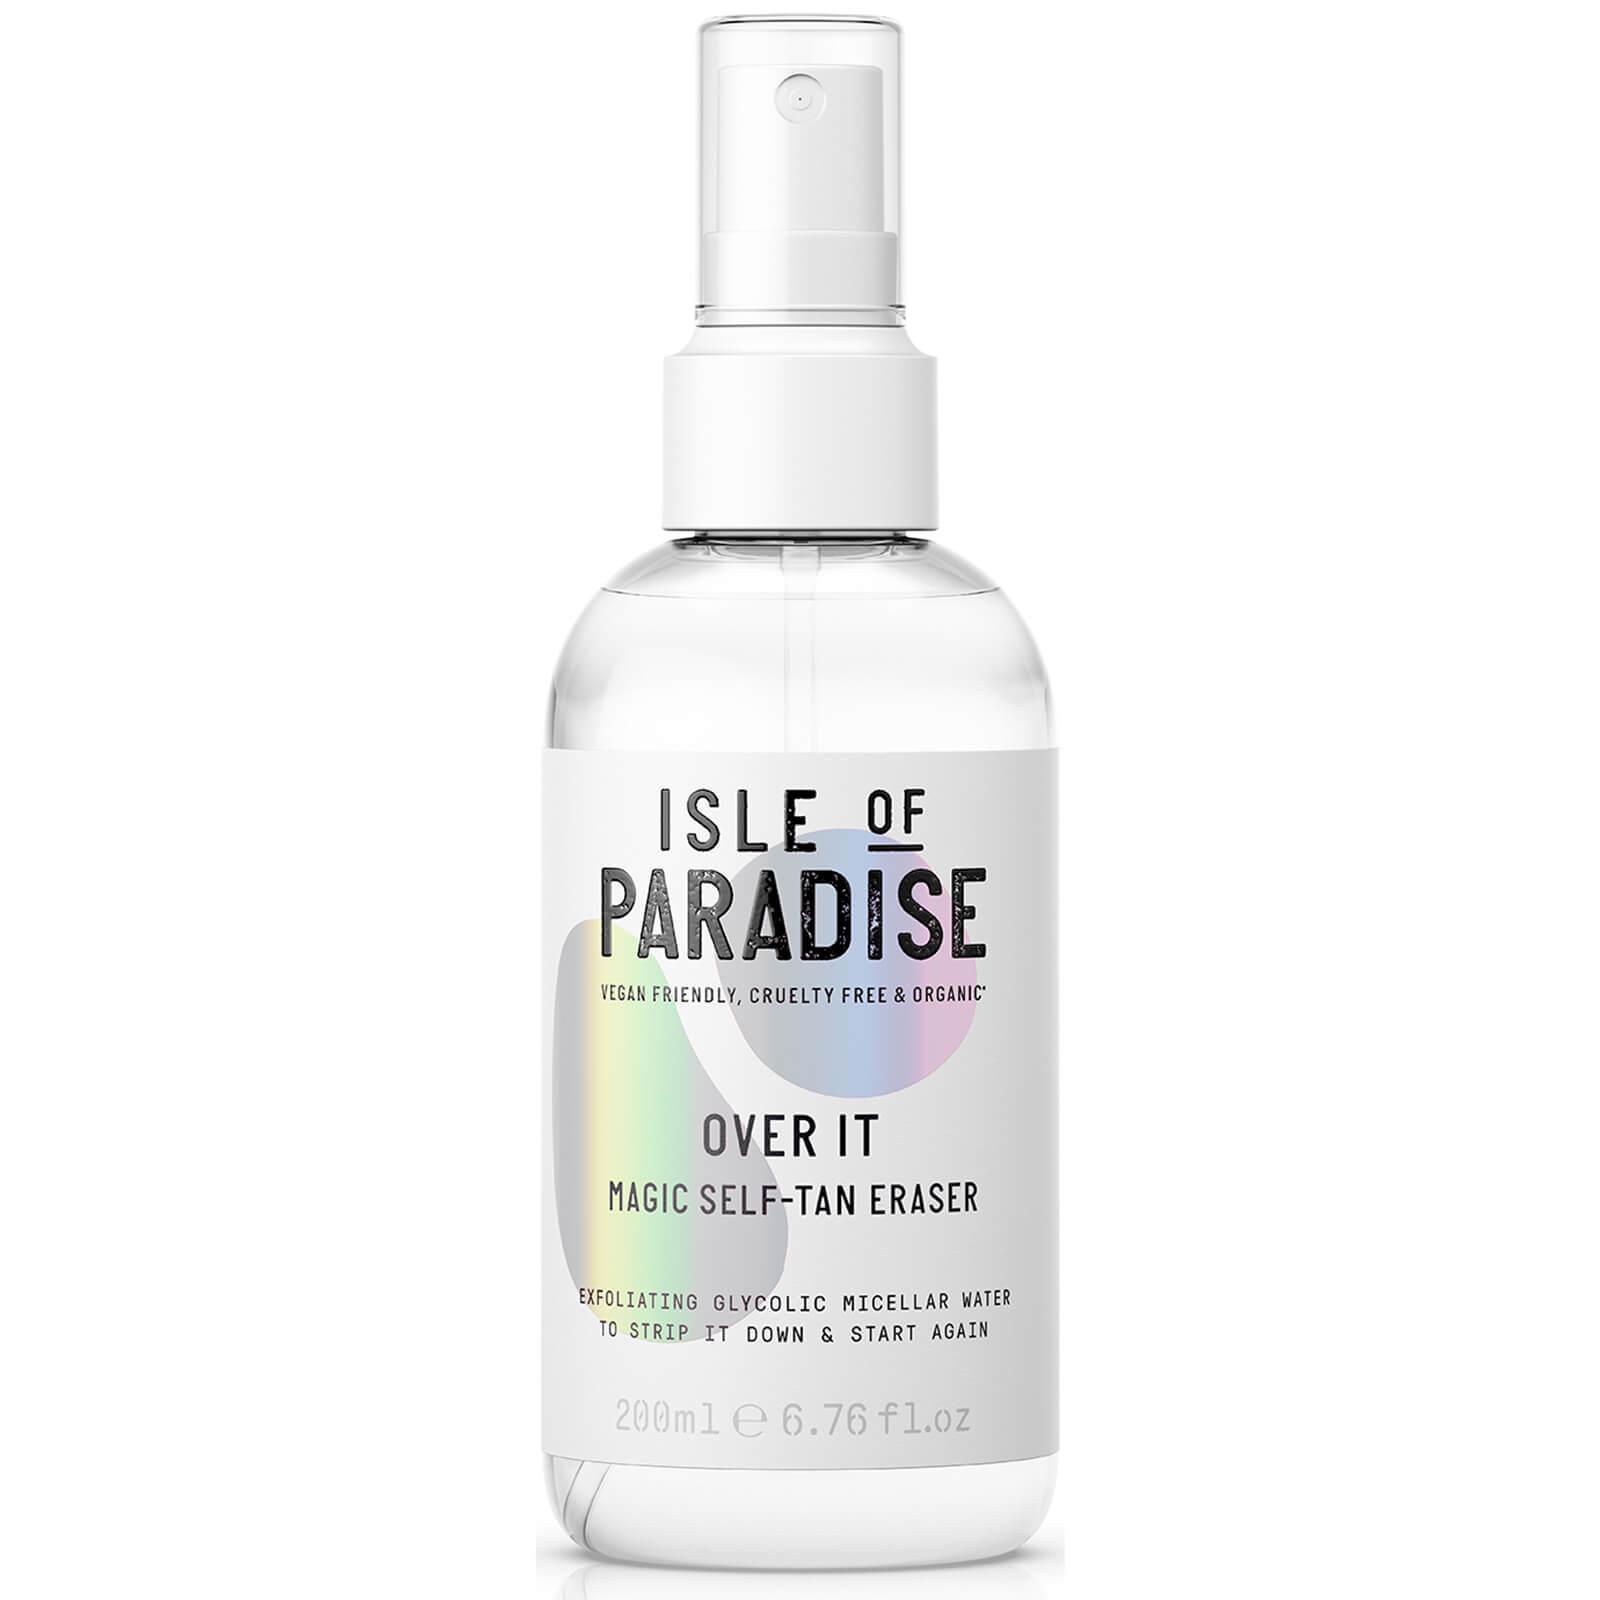 Купить Isle of Paradise Over it Magic Self-Tan Eraser 200ml